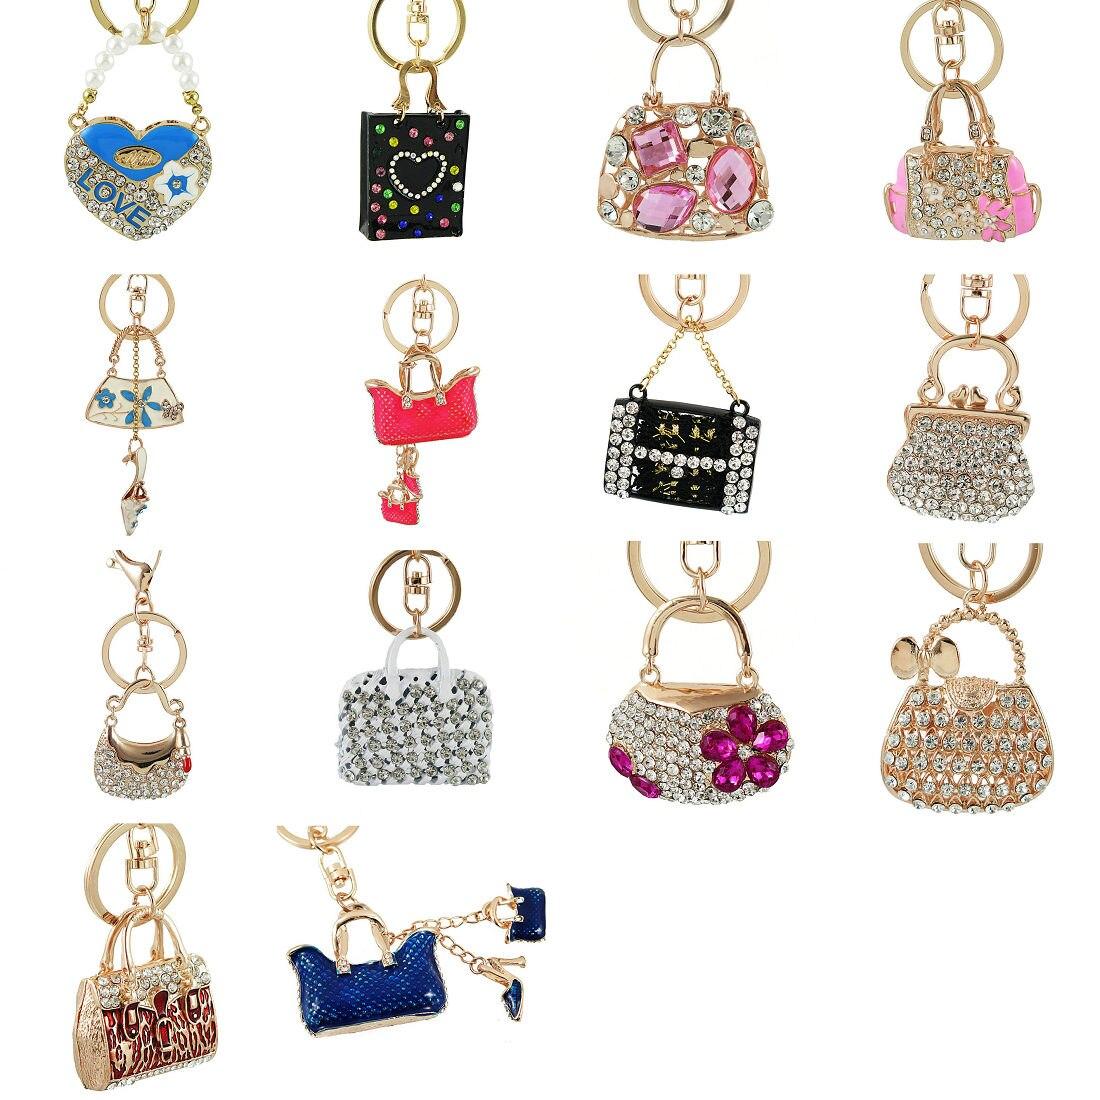 Exquisite Charm Fashion Keychain Creative Handbag Shaped Design Keychain Crystal Purse Bag Keyring Key Chain Female Gift